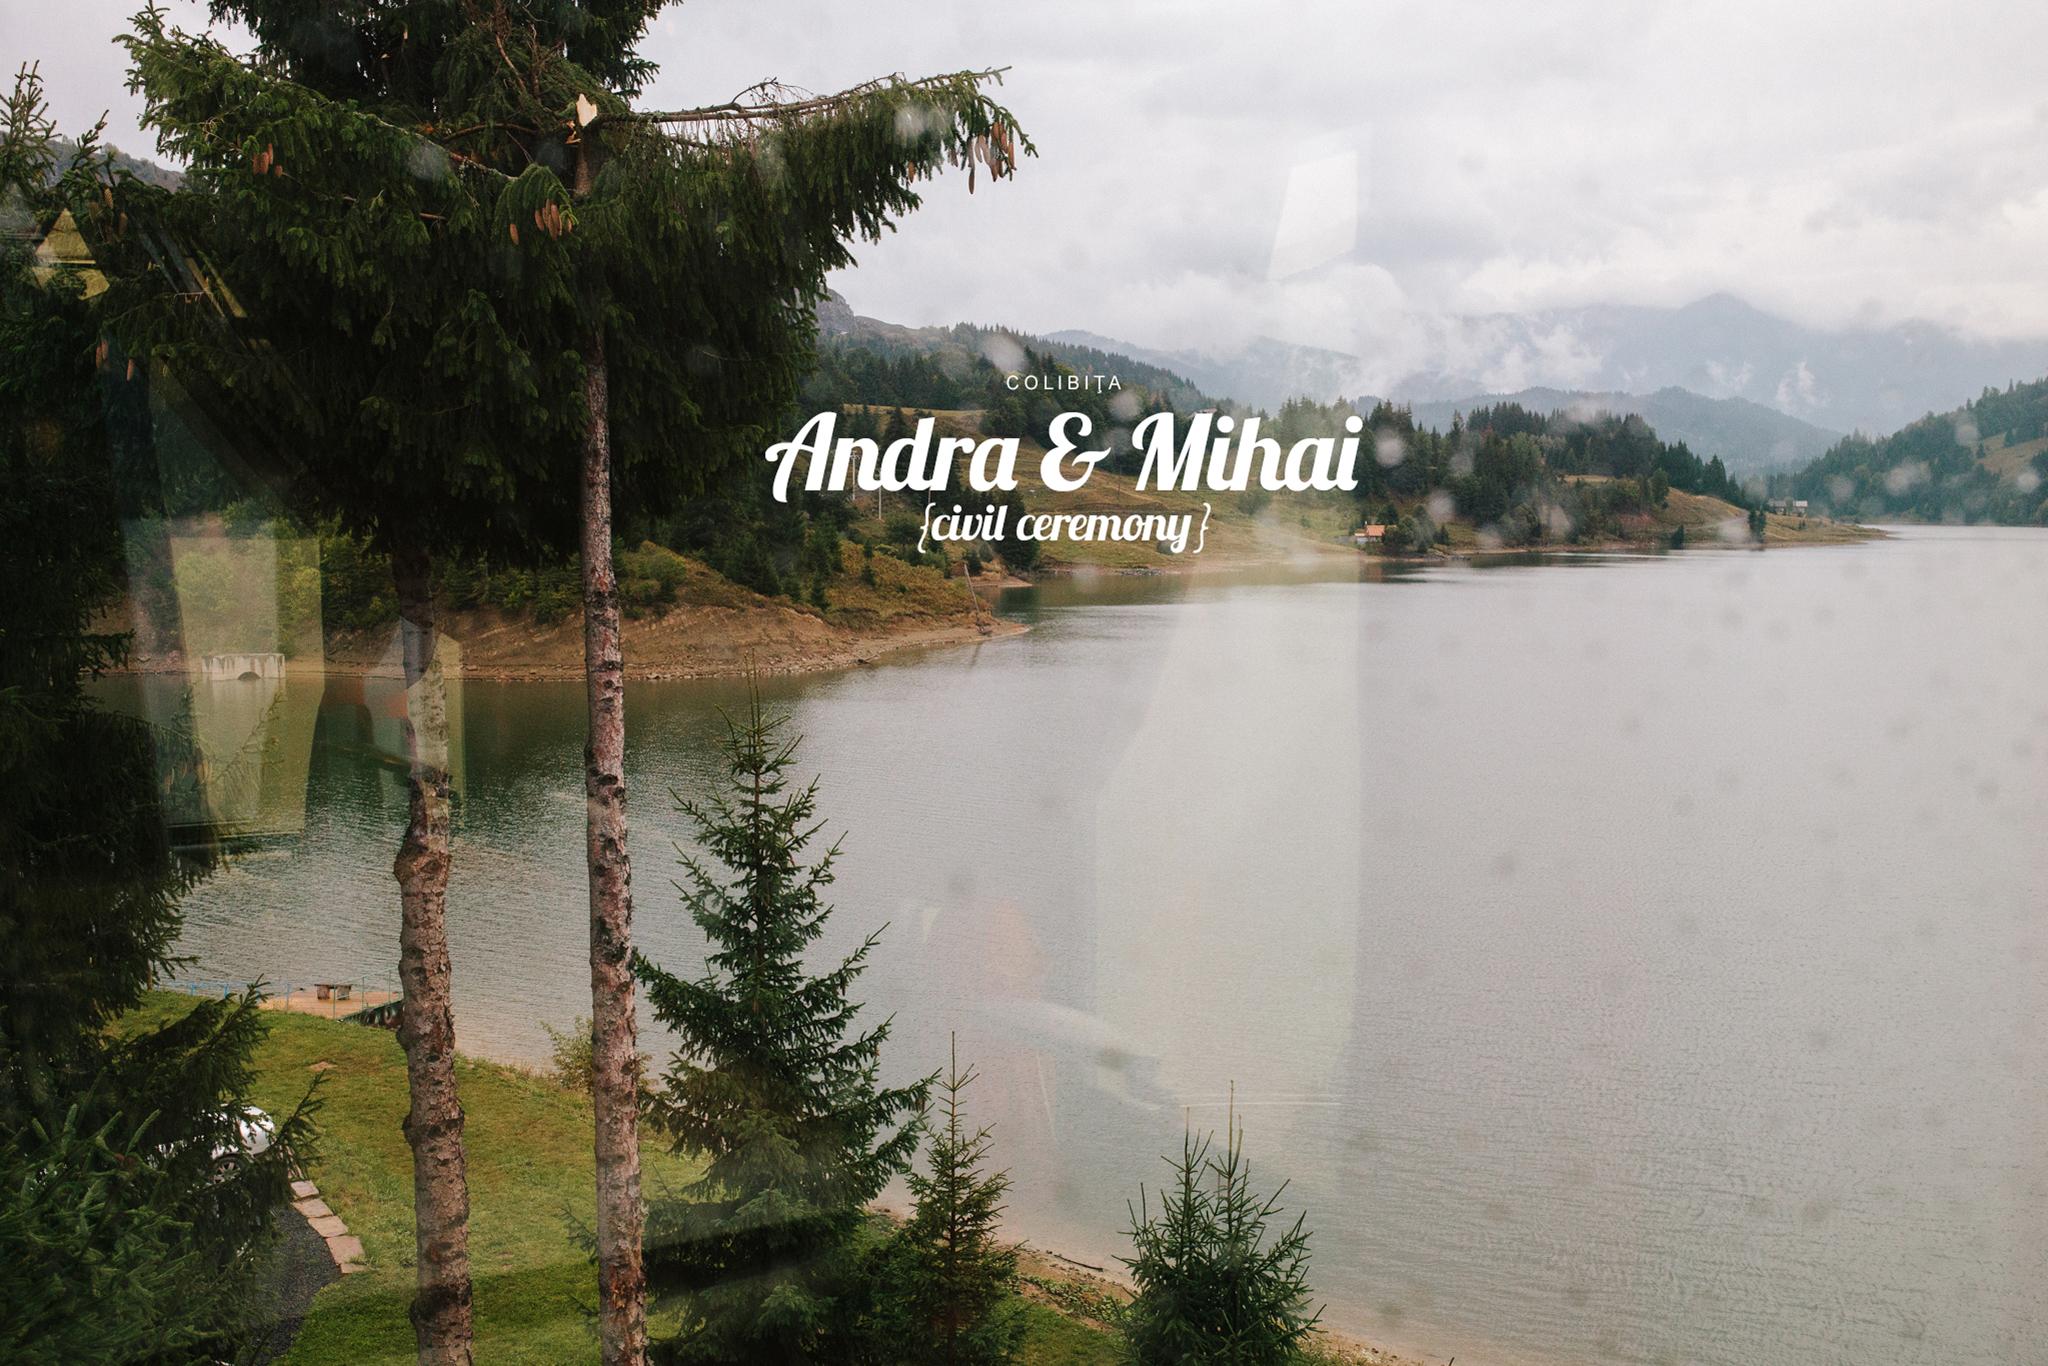 Andra + Mihai {civil ceremony} 001